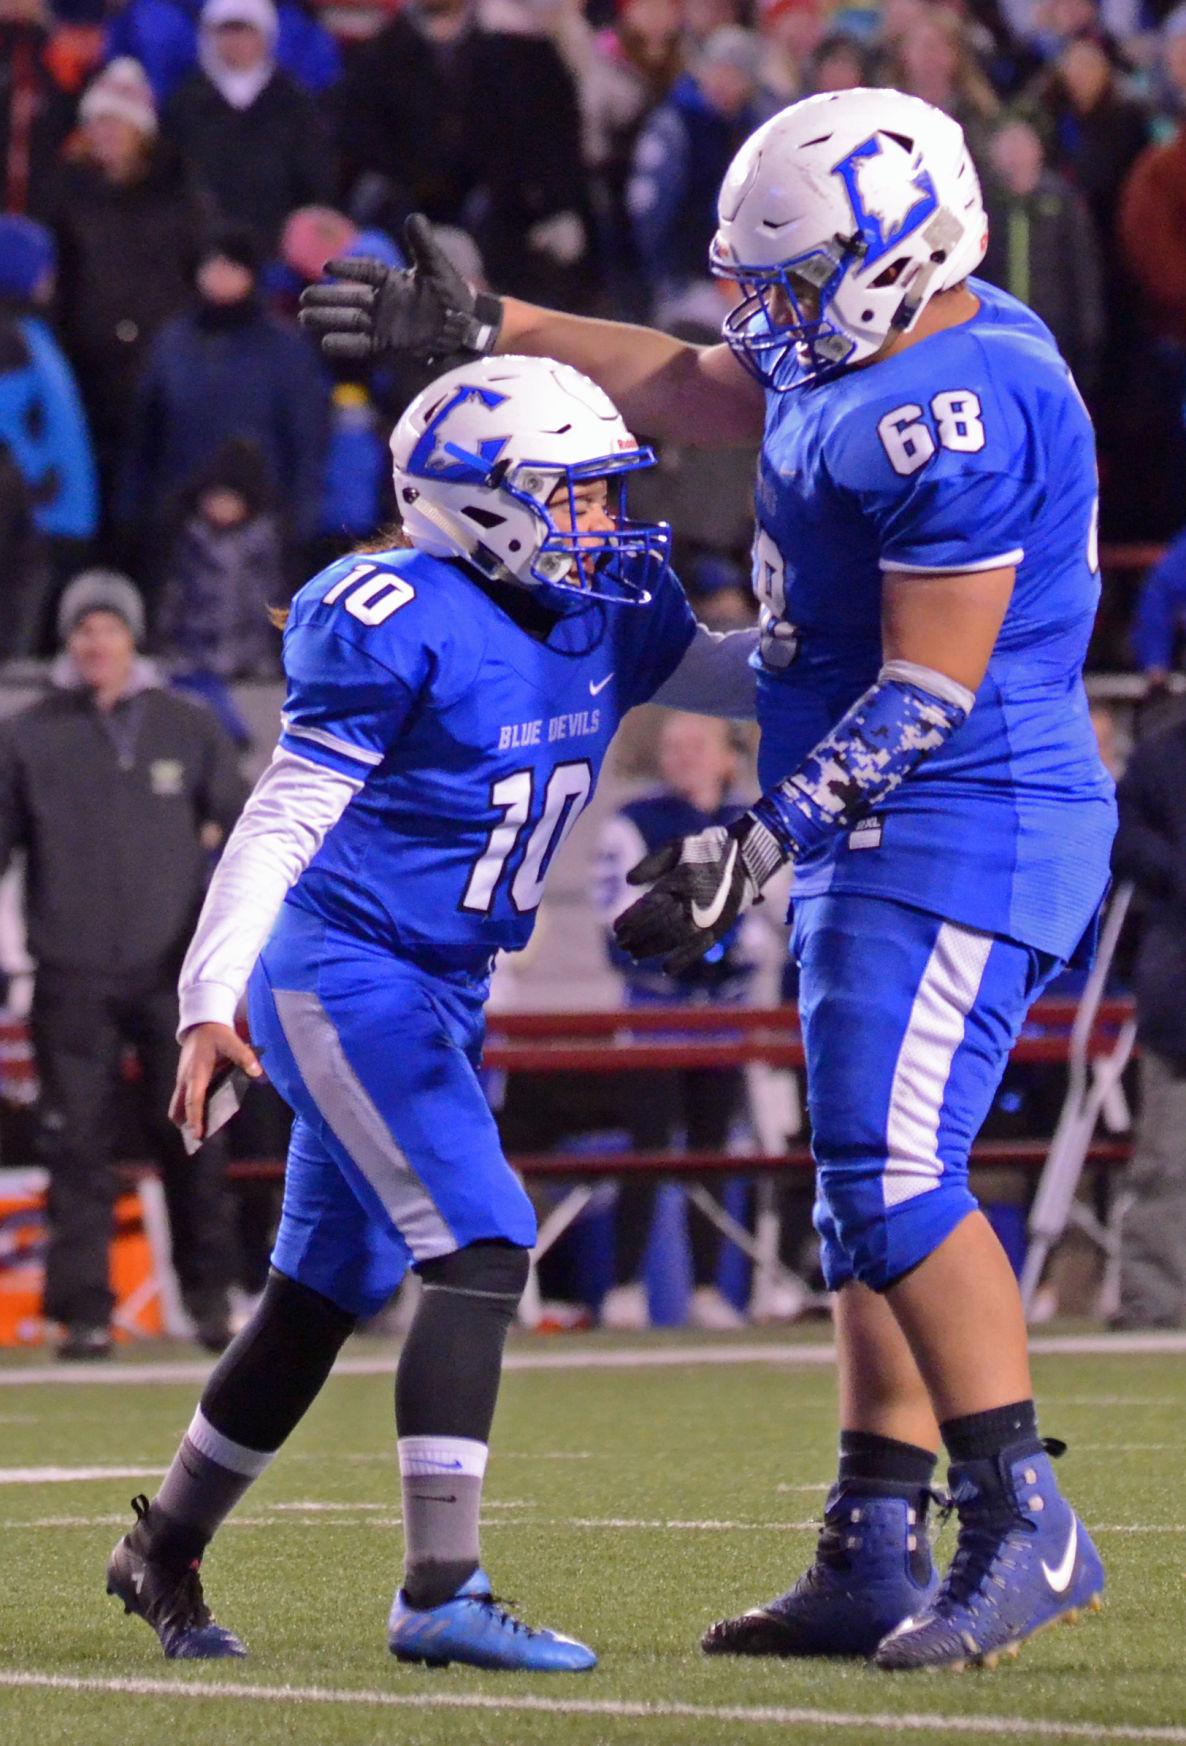 WIAA state football final: Lodi's Savannah Curtis and Tyler Leonard